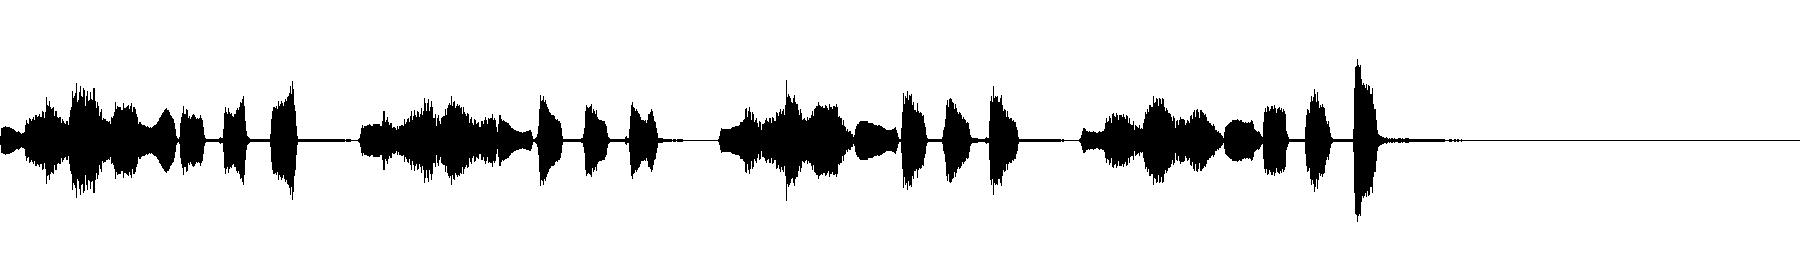 pack1 electricguitar mood 1 am6 90bpm